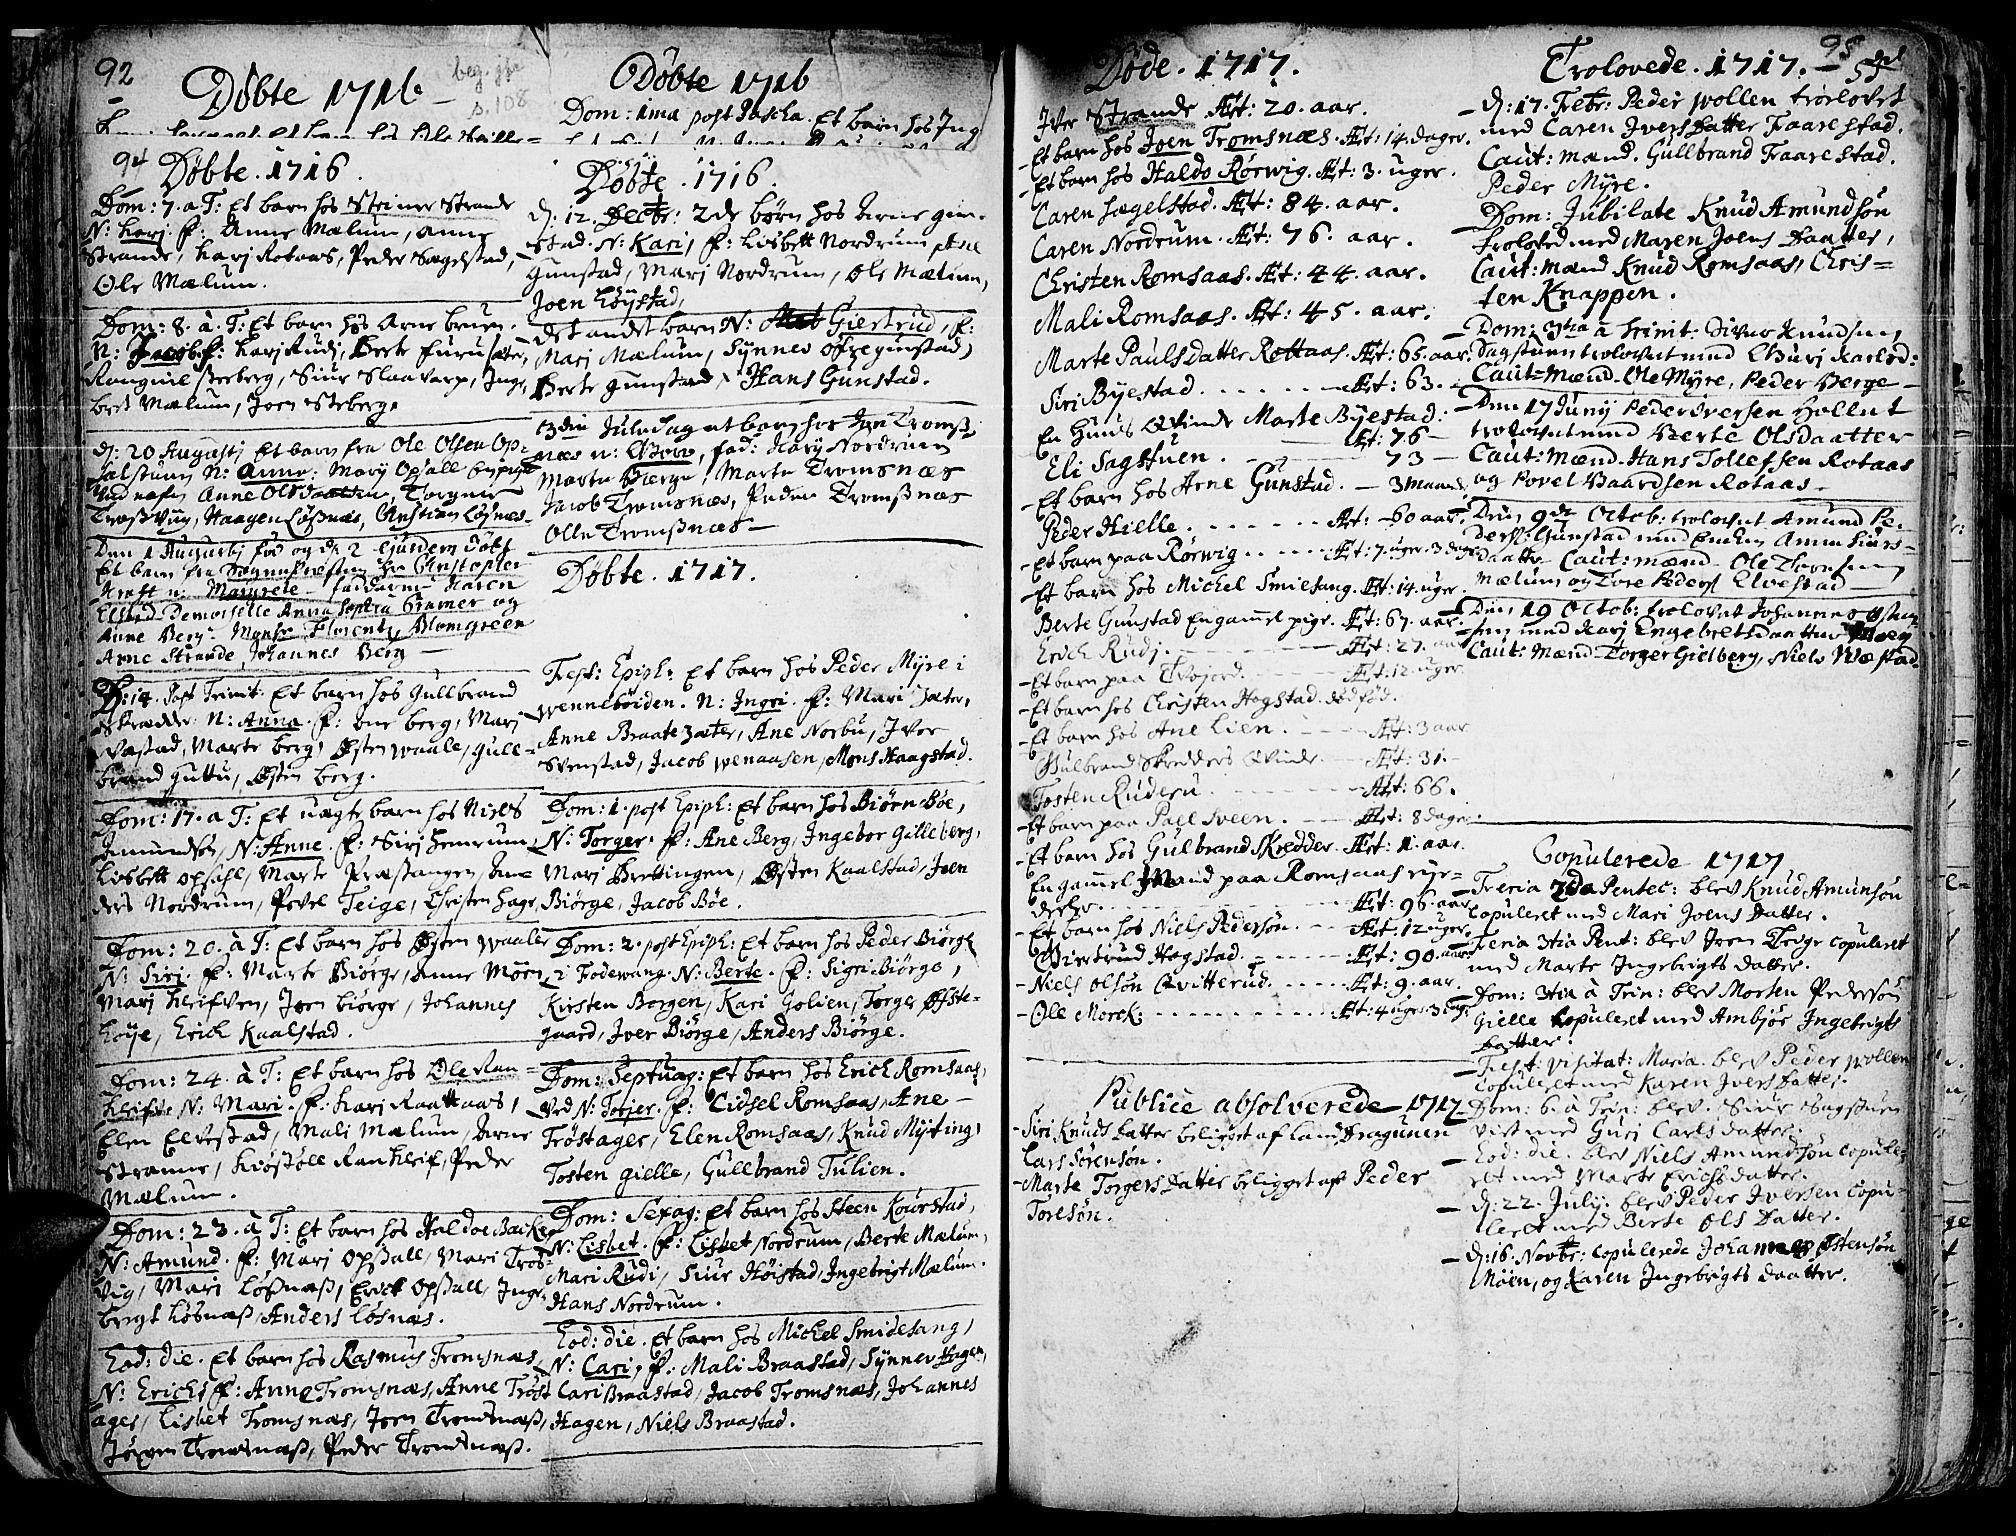 SAH, Ringebu prestekontor, Ministerialbok nr. 1, 1696-1733, s. 94-95